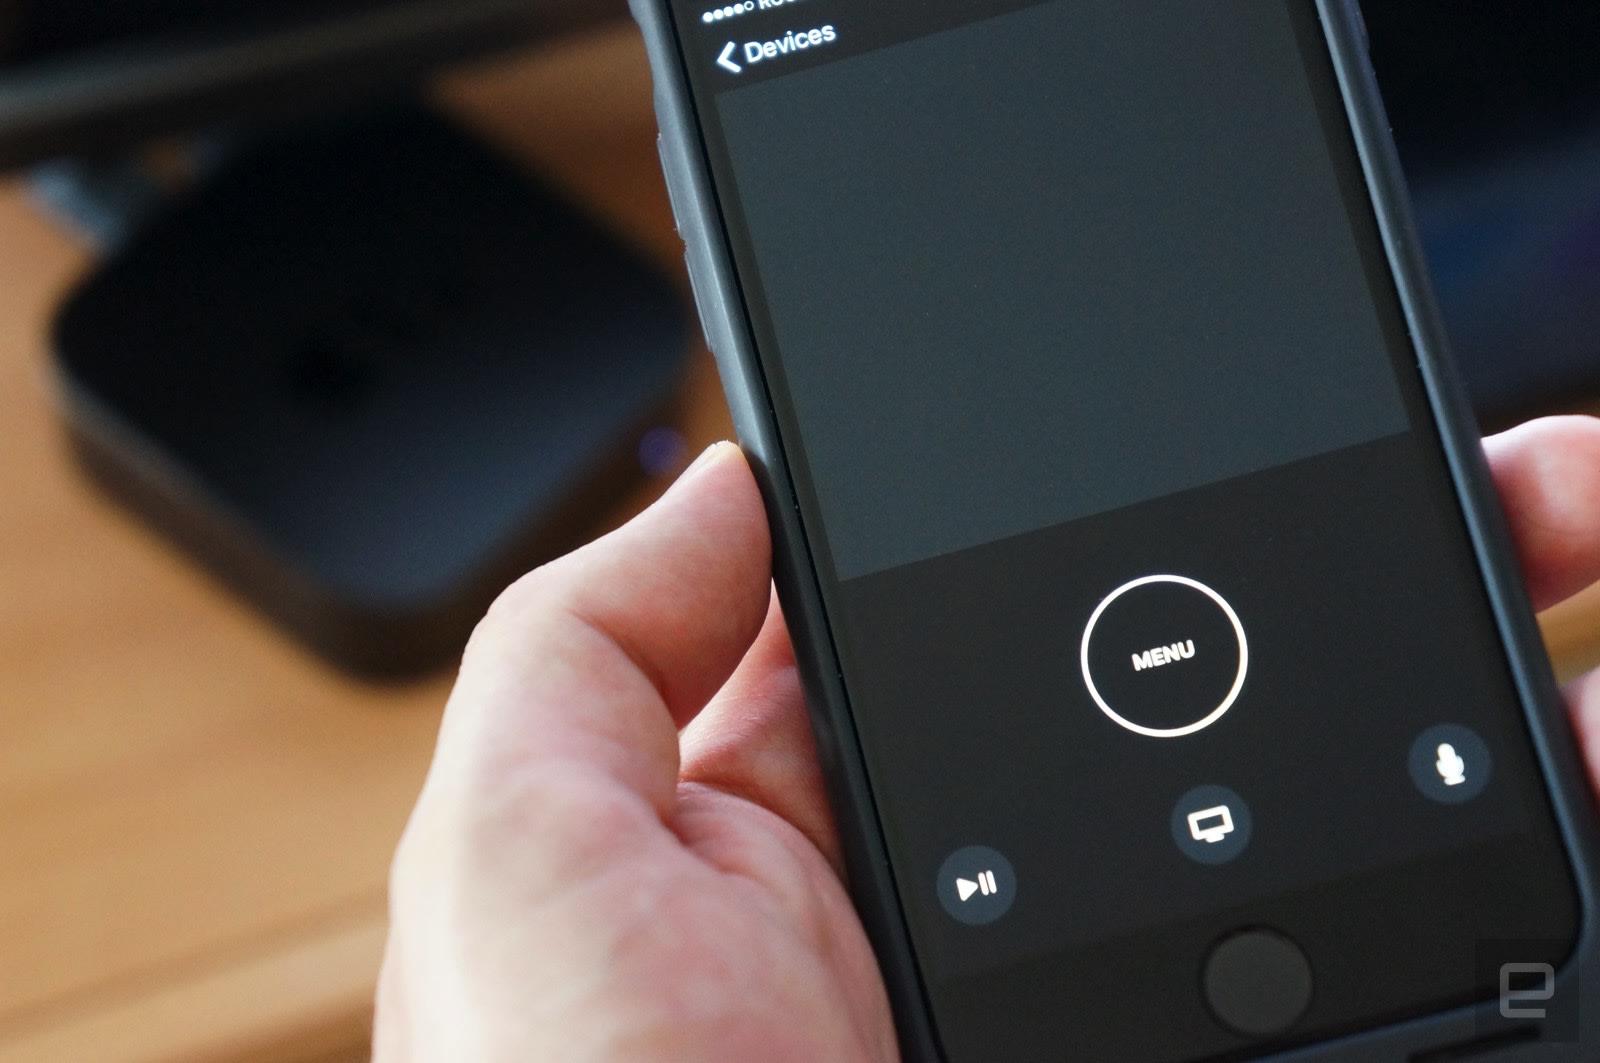 Apple TV's new iPhone remote control app talks to Siri